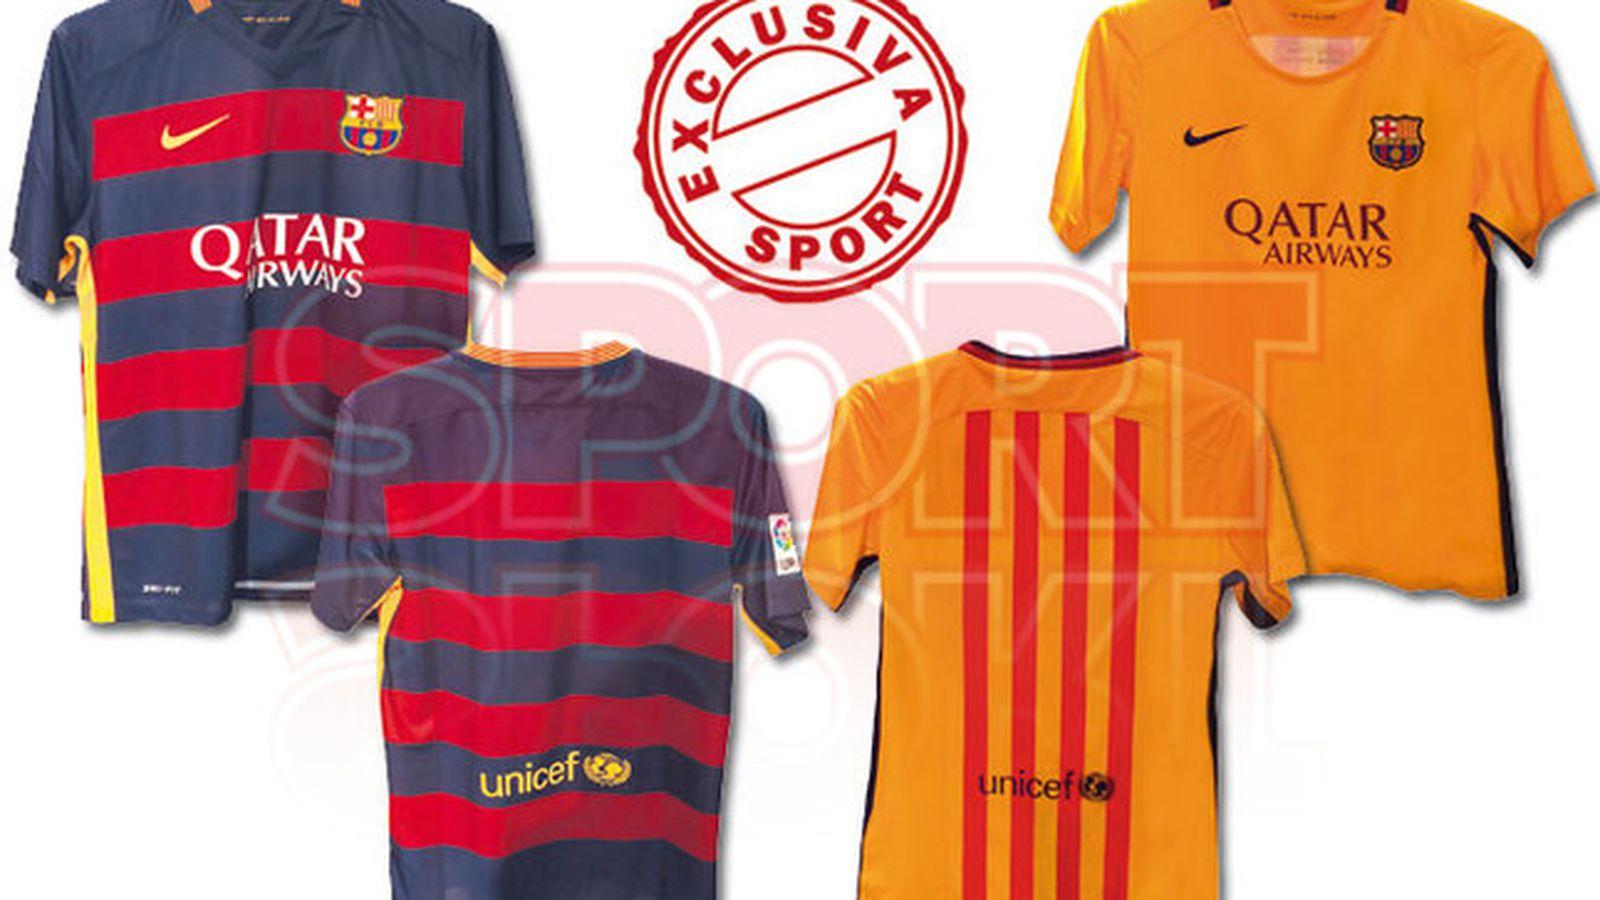 New Photos of The 2015-16 FC Barcelona Kits